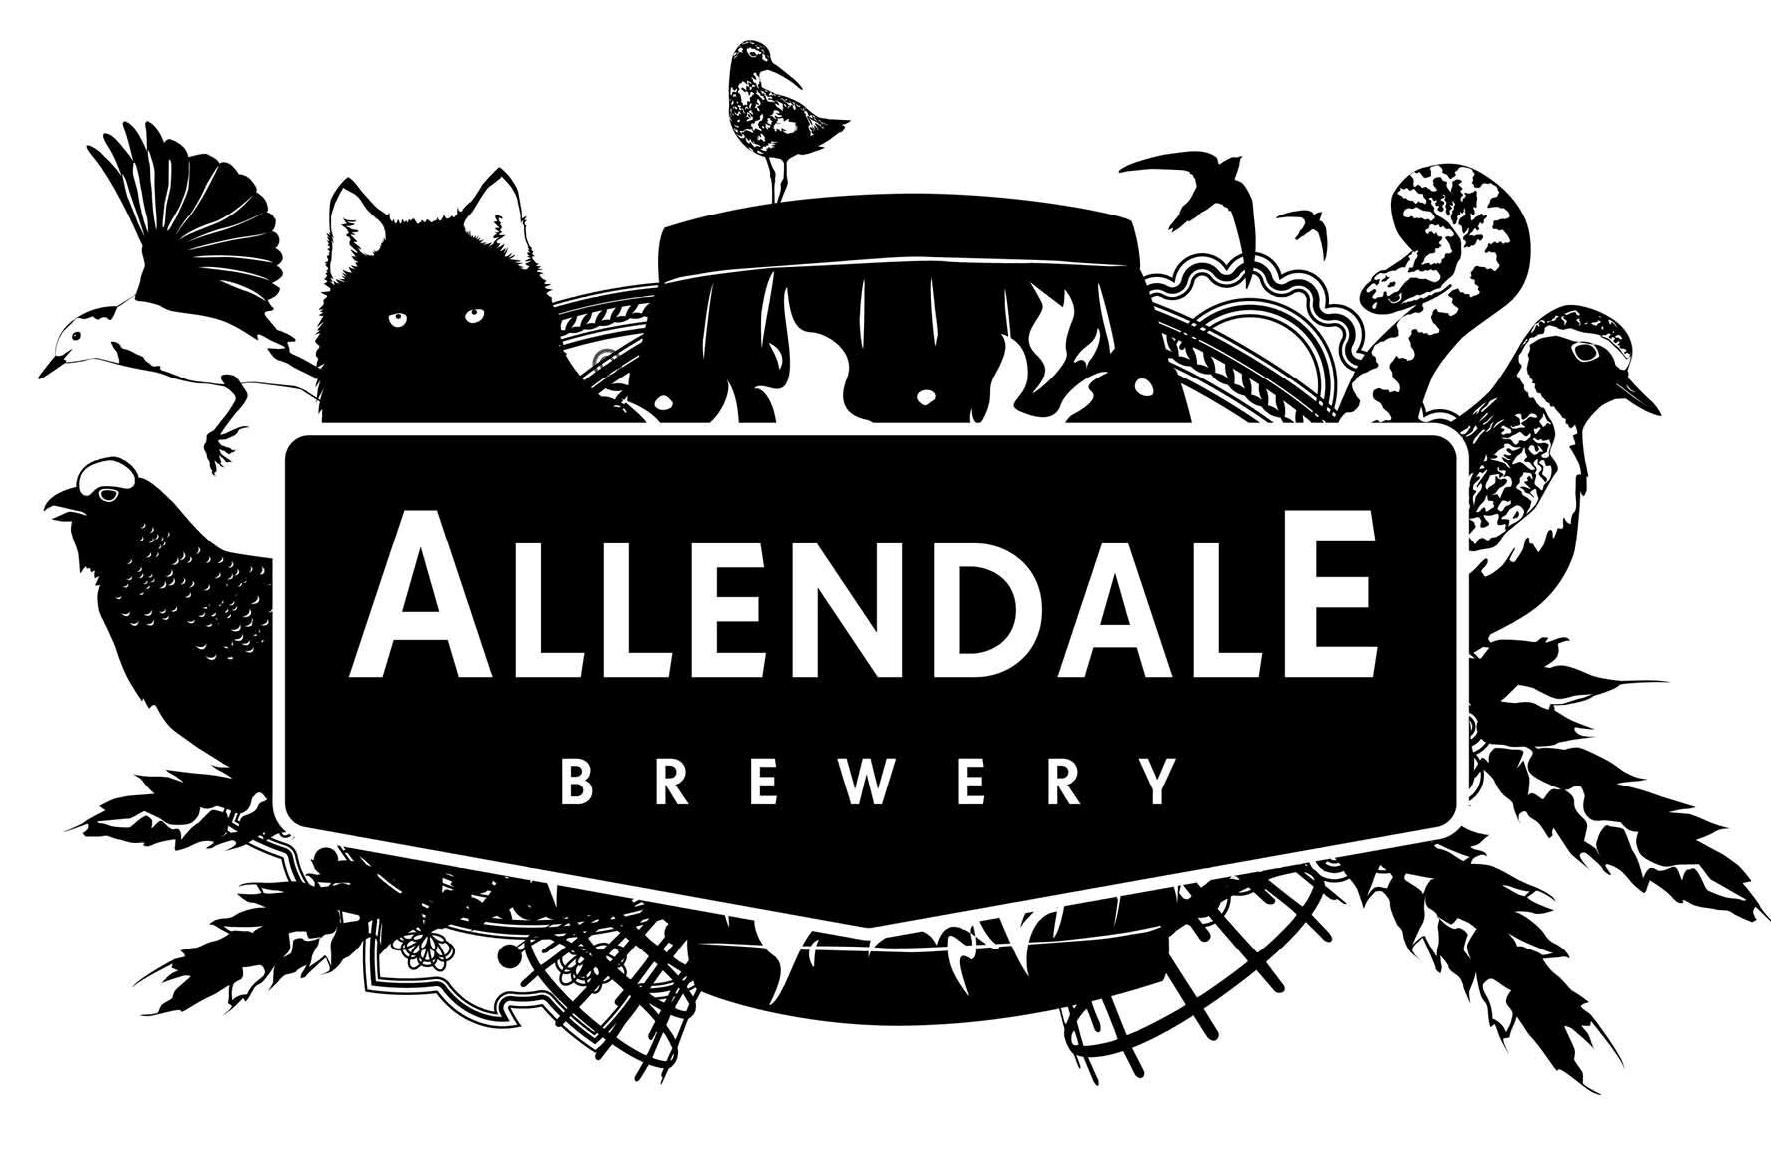 Allendale Brewery Ltd